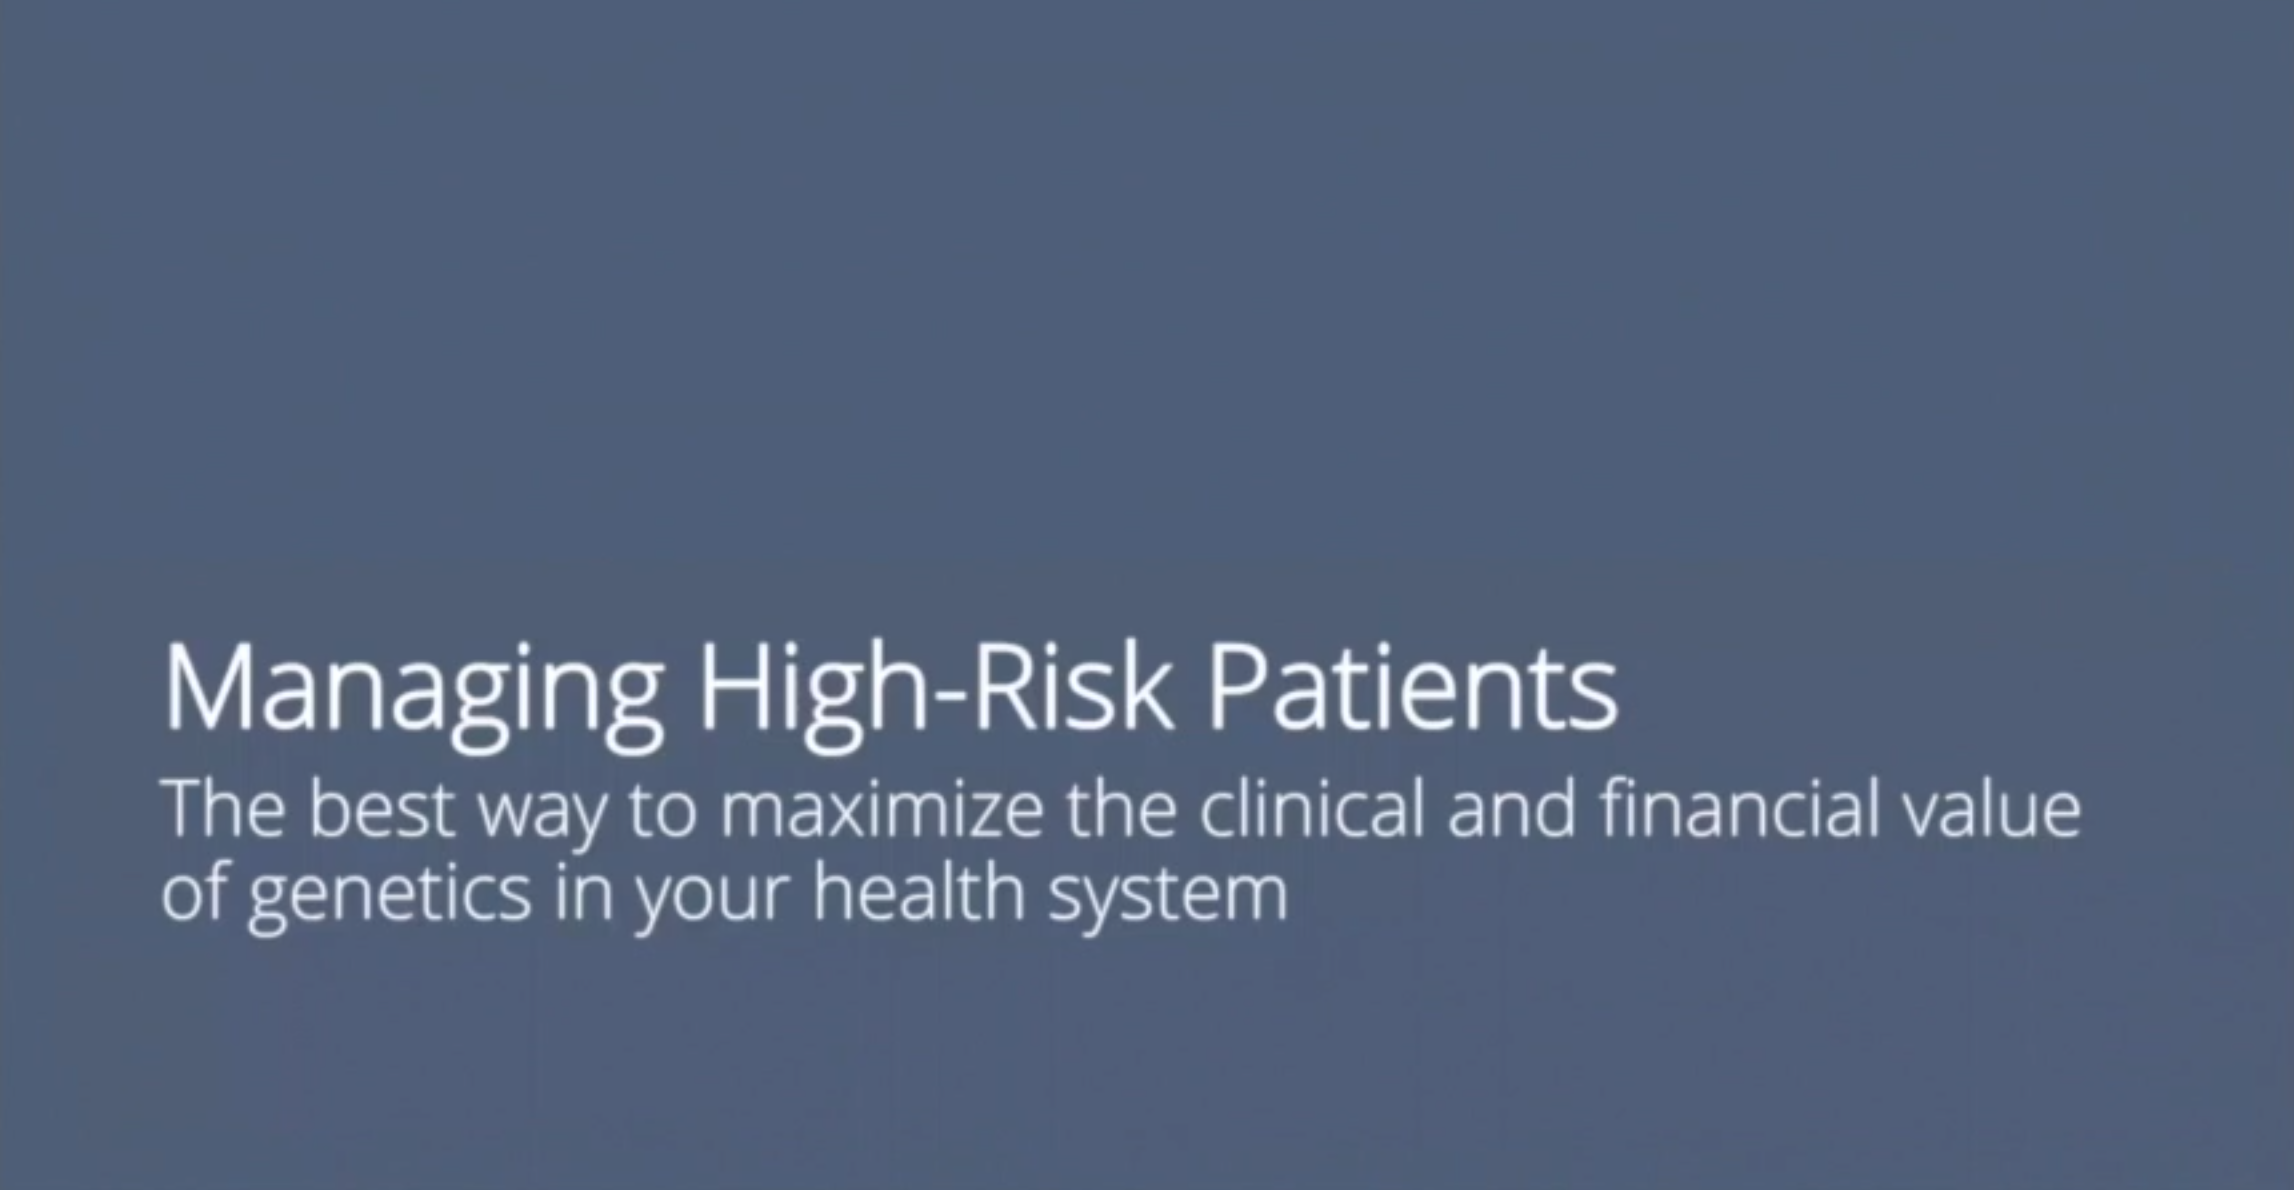 04_Mange high-risk patients